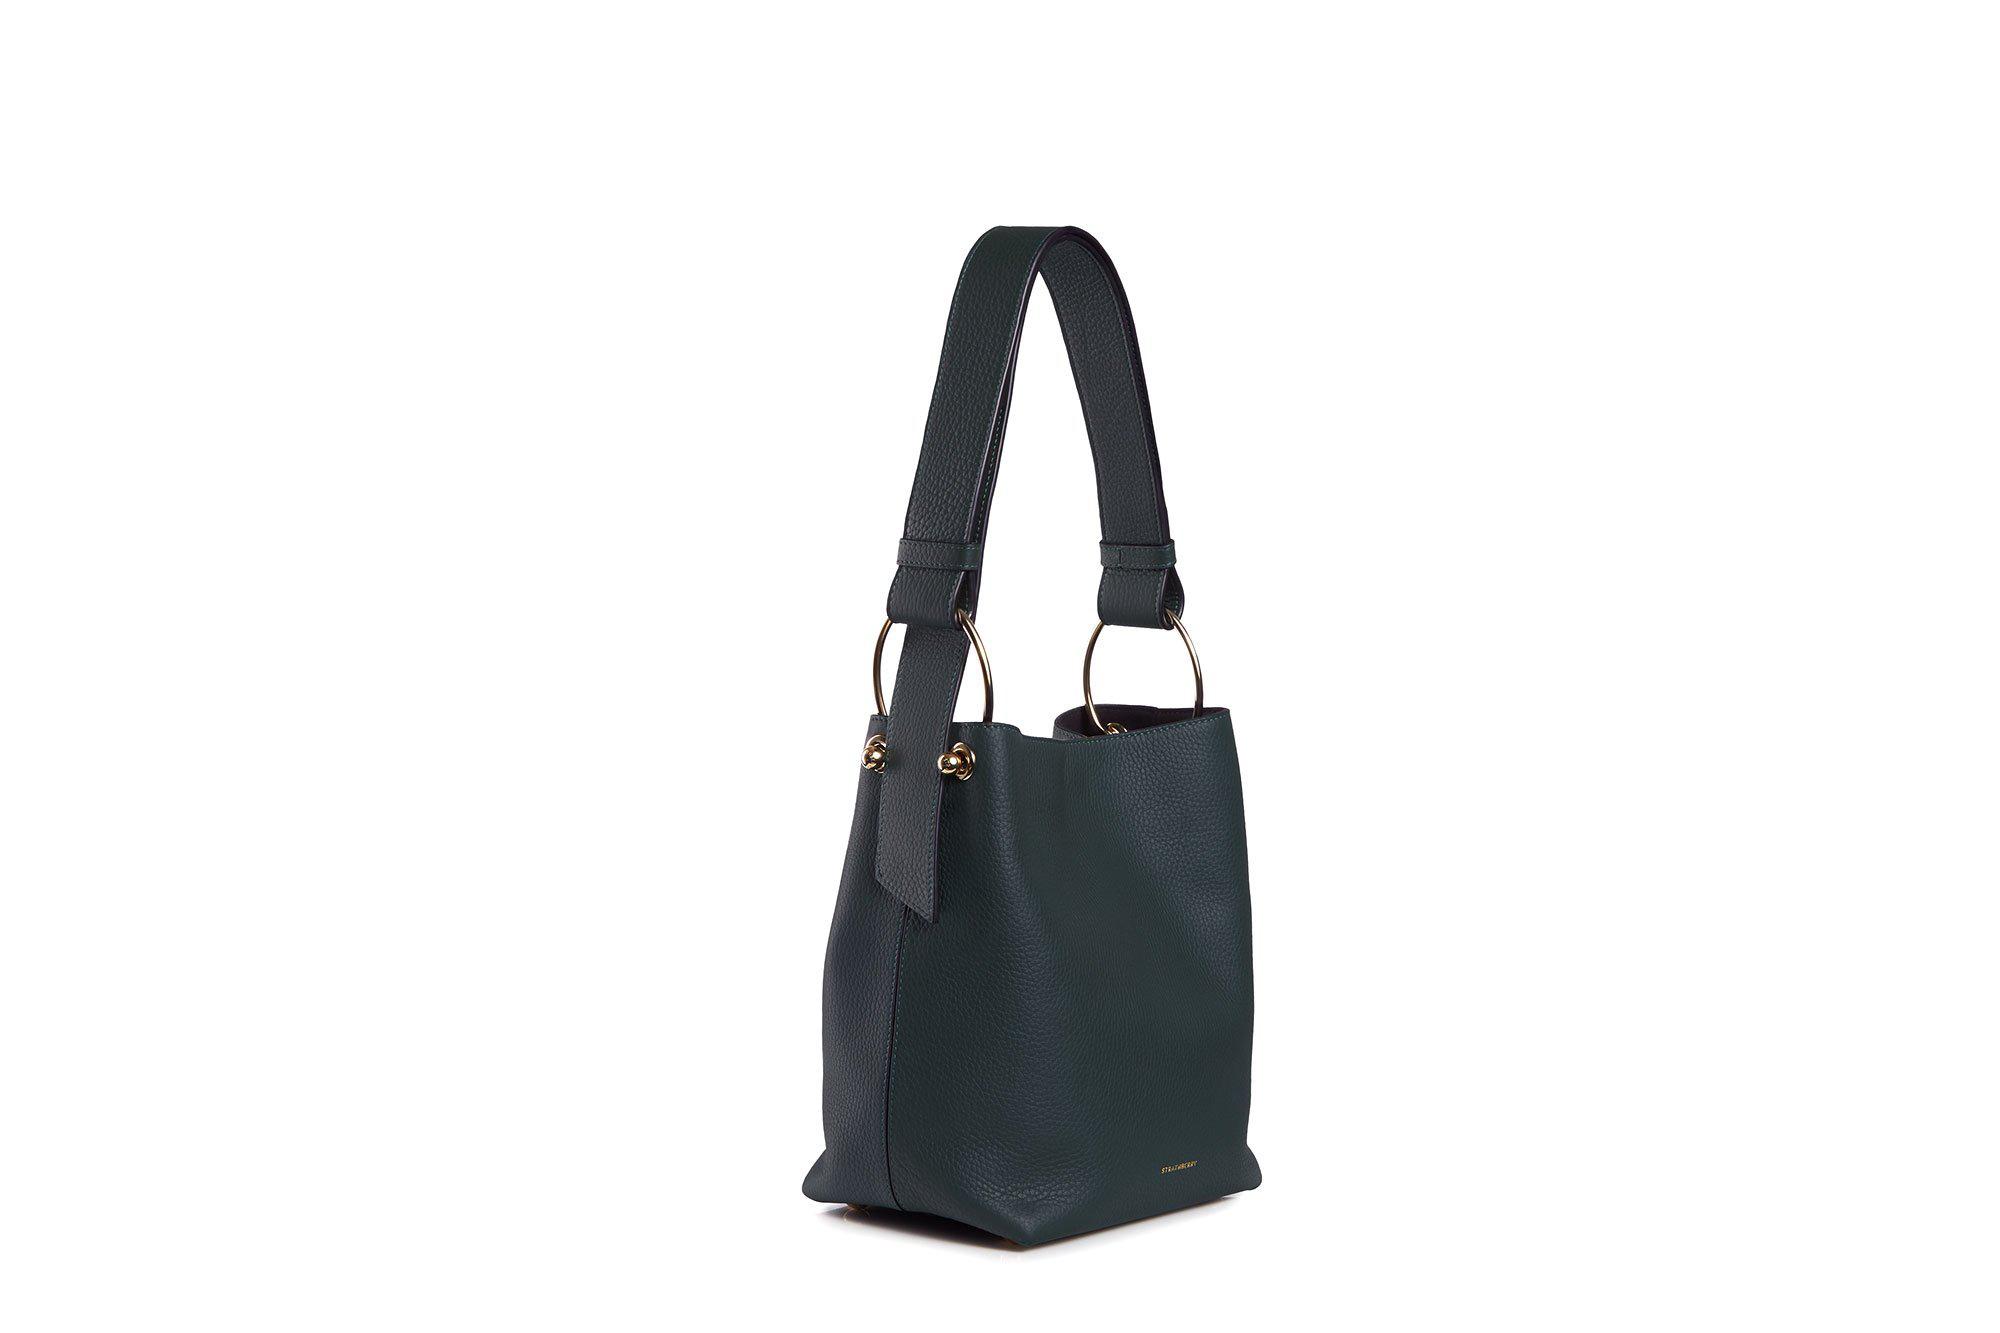 Strathberry Lana Midi Bucket Bag - Bottle Green